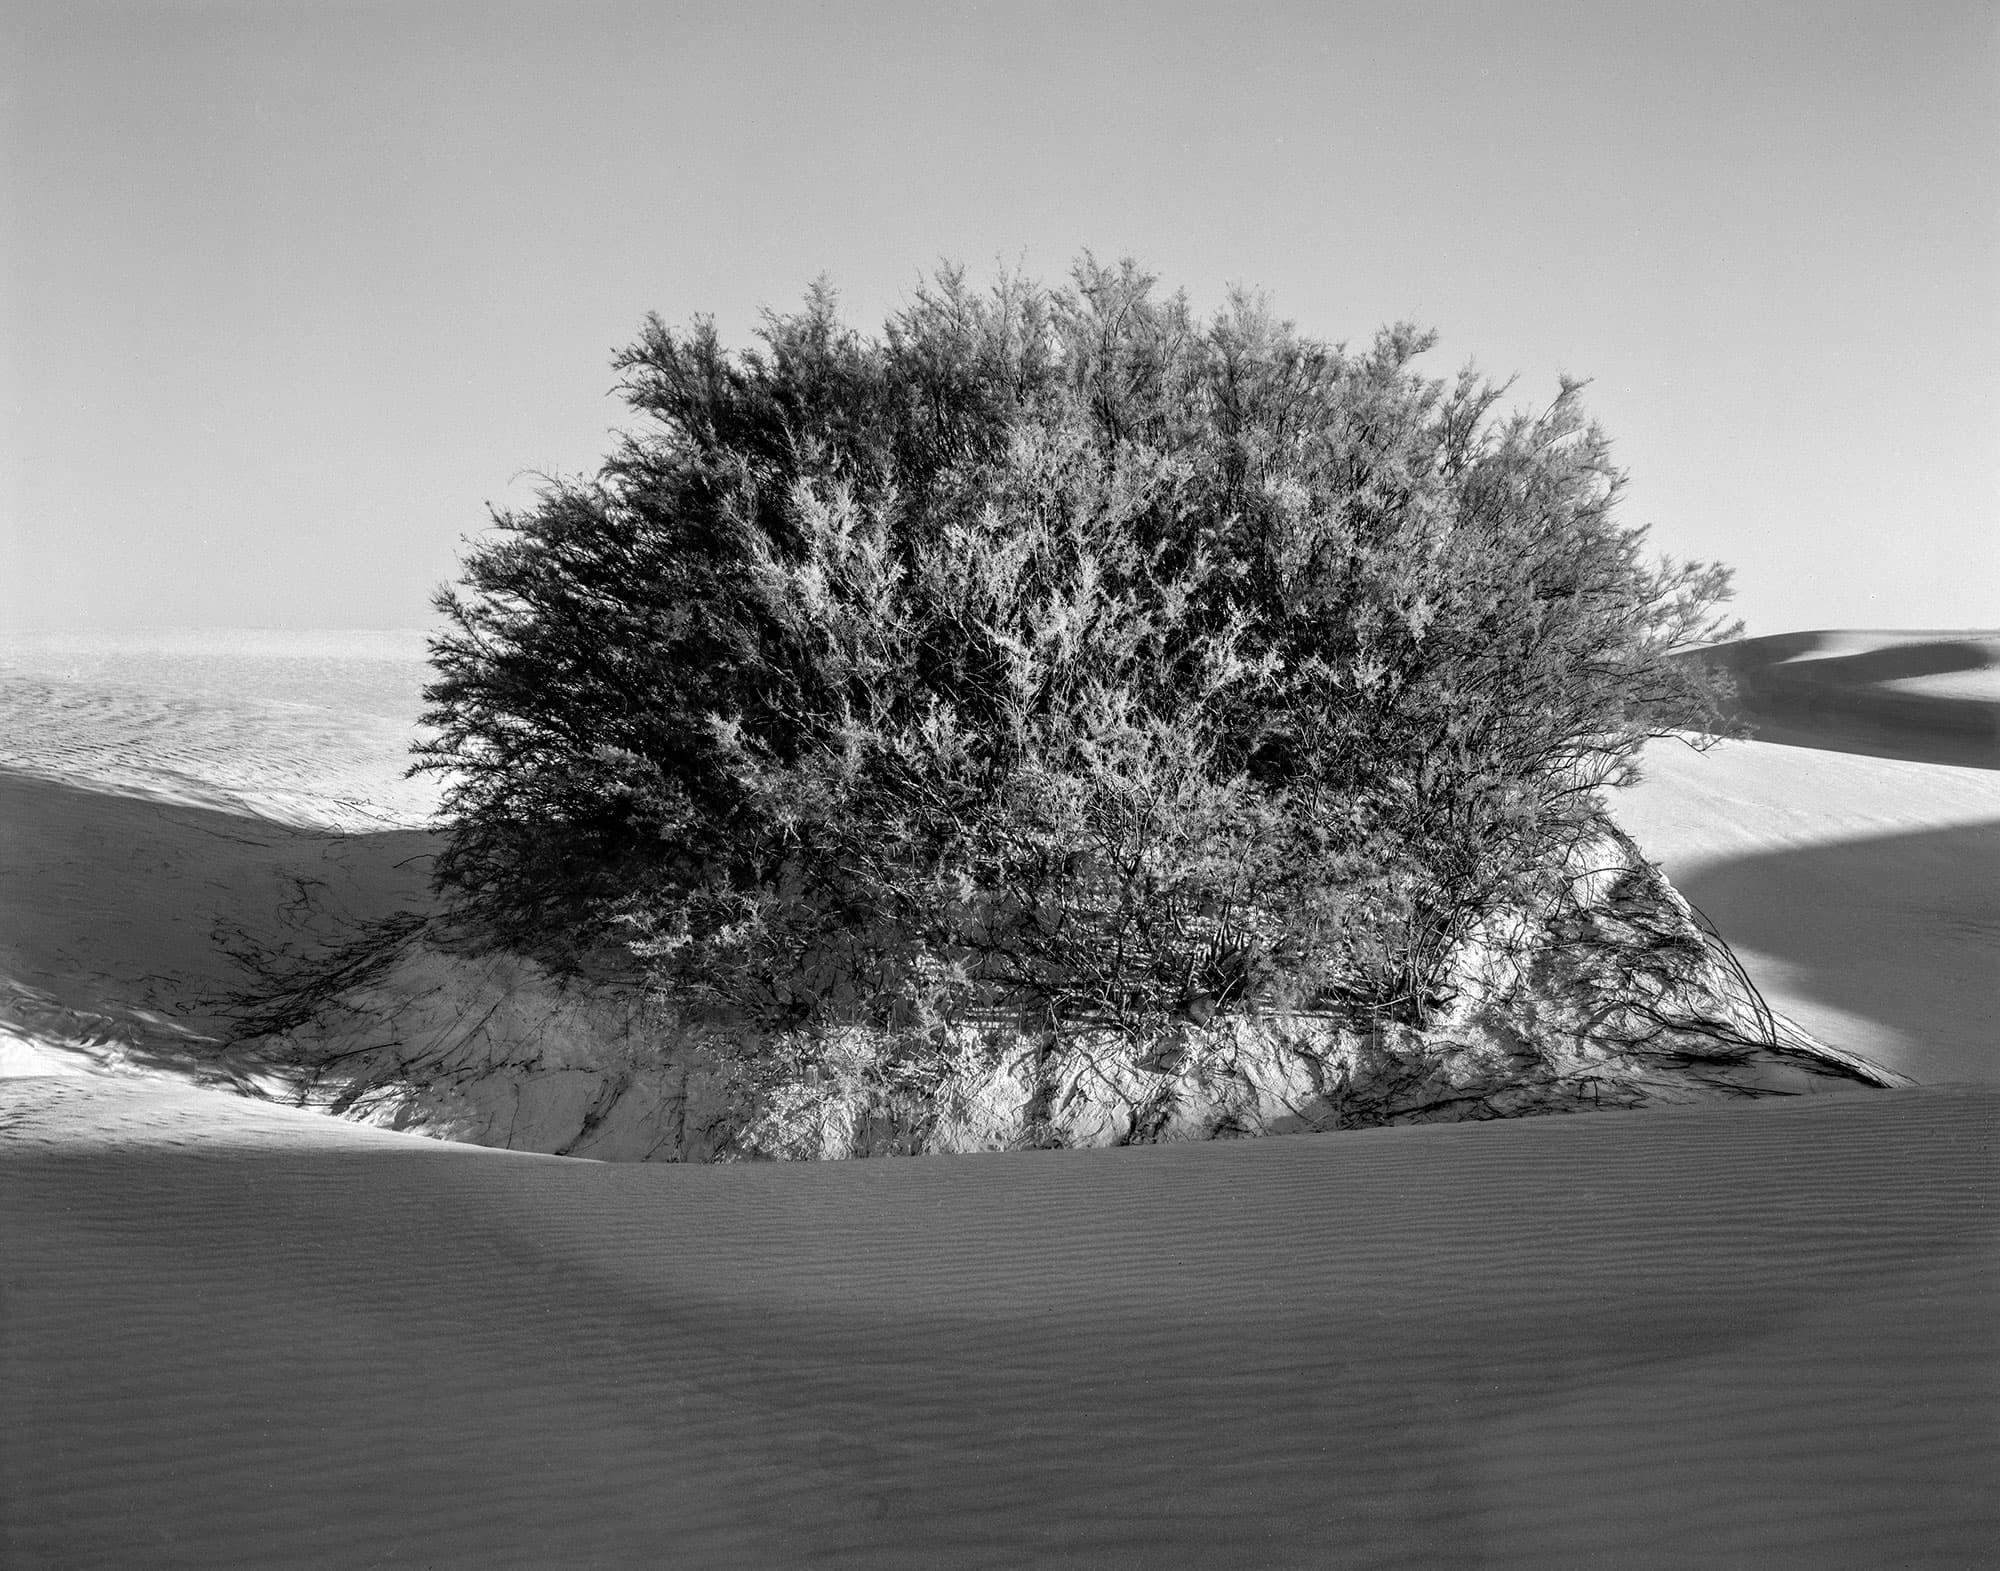 arthur-lazar-White-Sands-New-Mexico-1976